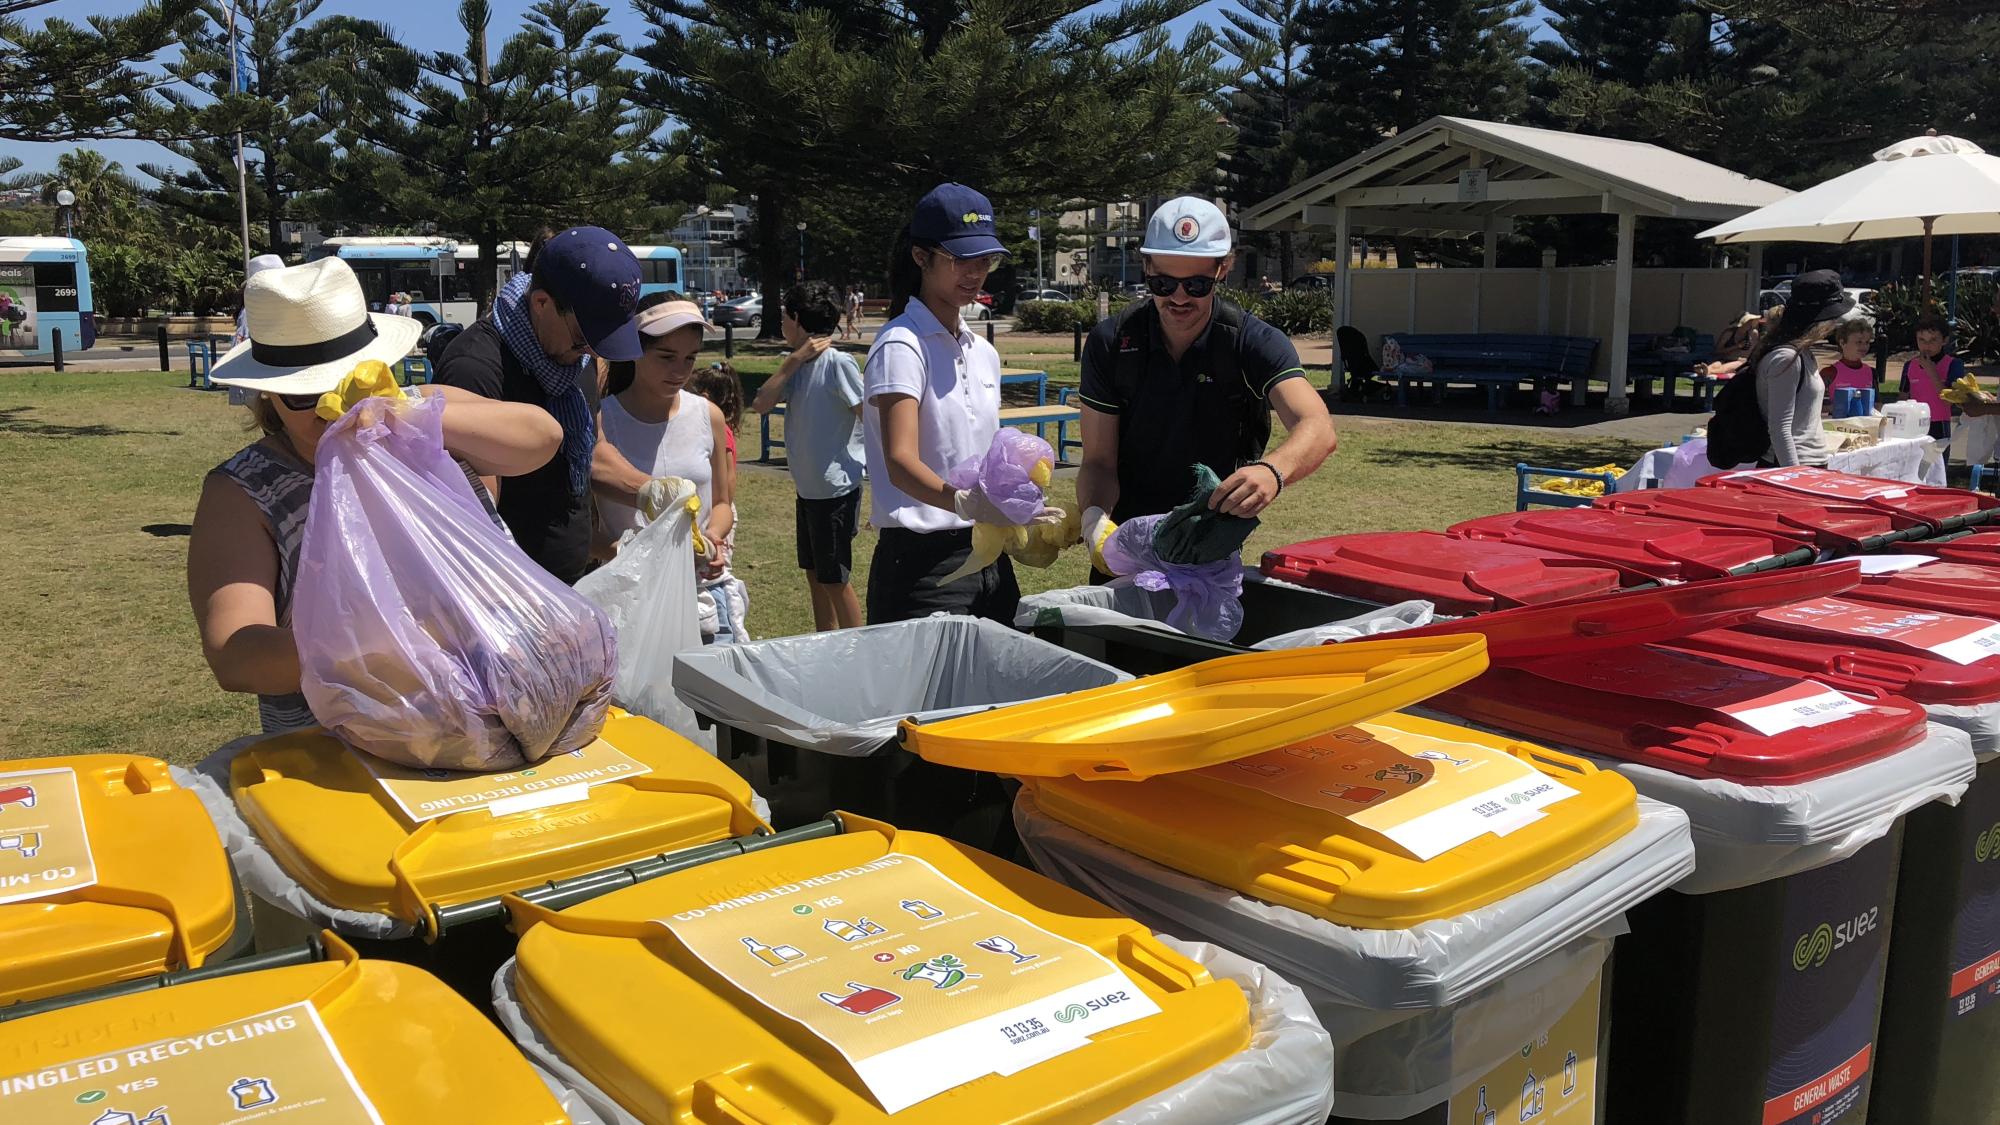 SUEZ_ANZ News Coogee beach clean up